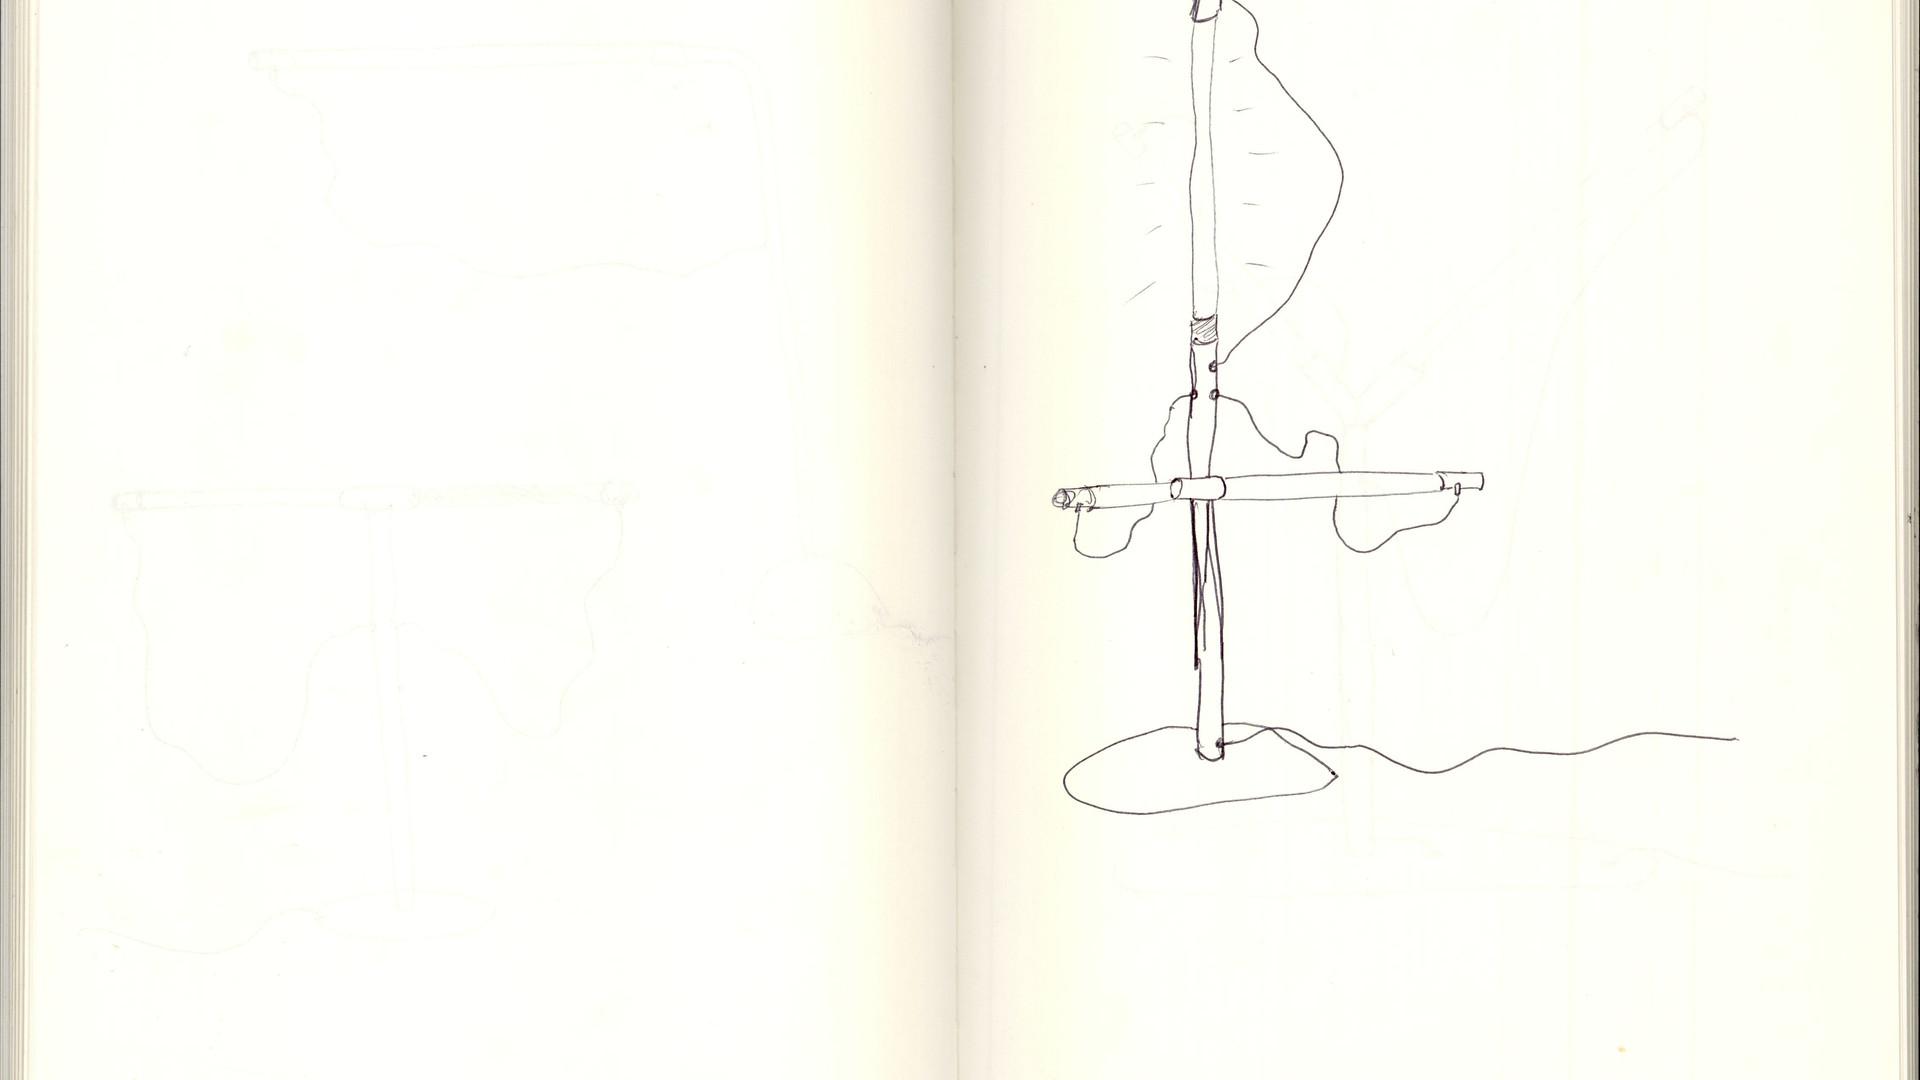 scan1.12 (1).jpg